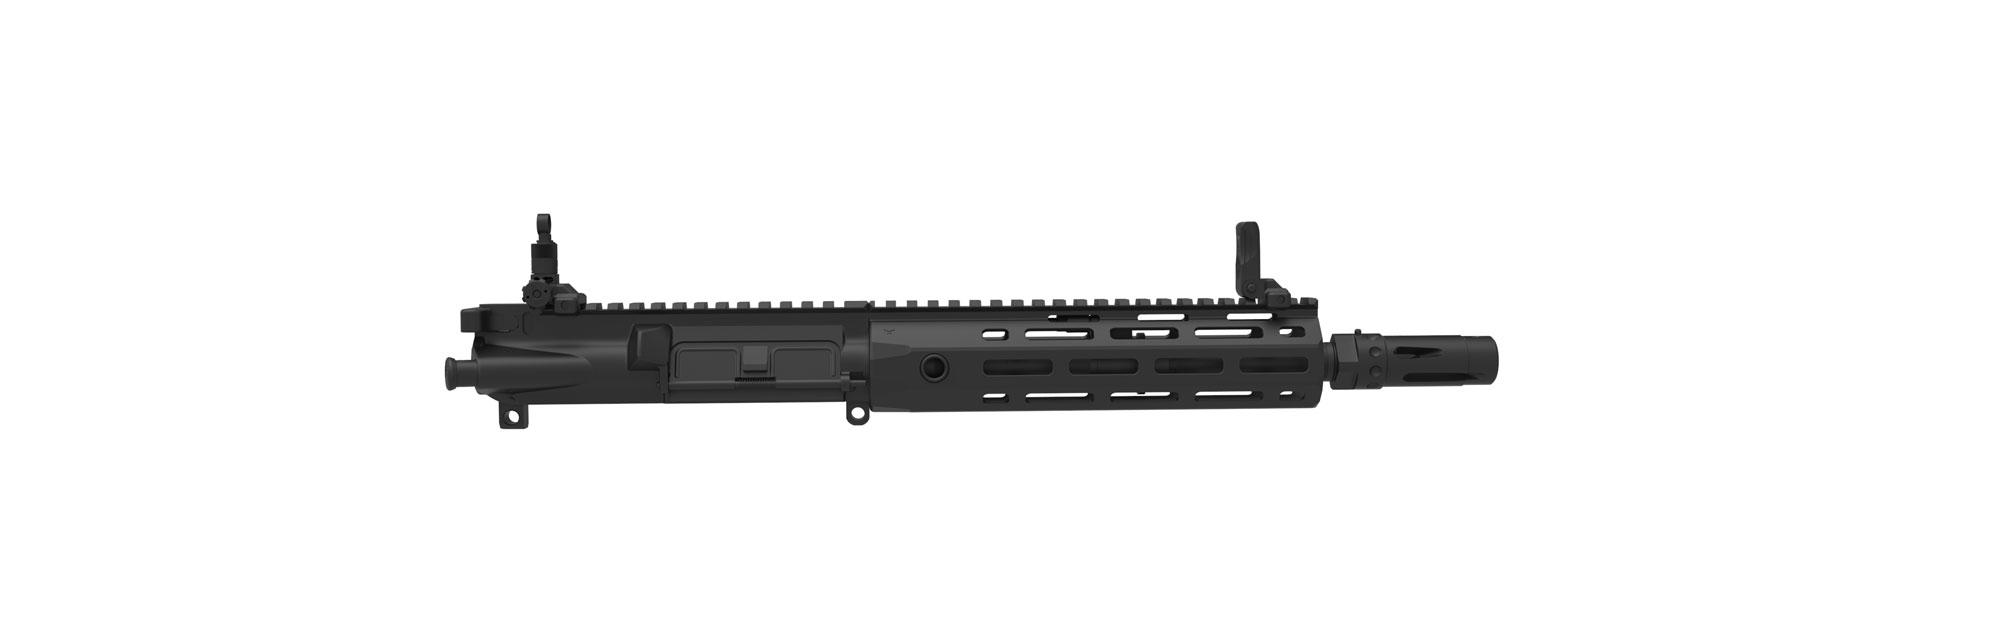 UPPER RECEIVER KIT, SR-30 MOD 2 9 5″ BARREL, URX 4, M-LOK